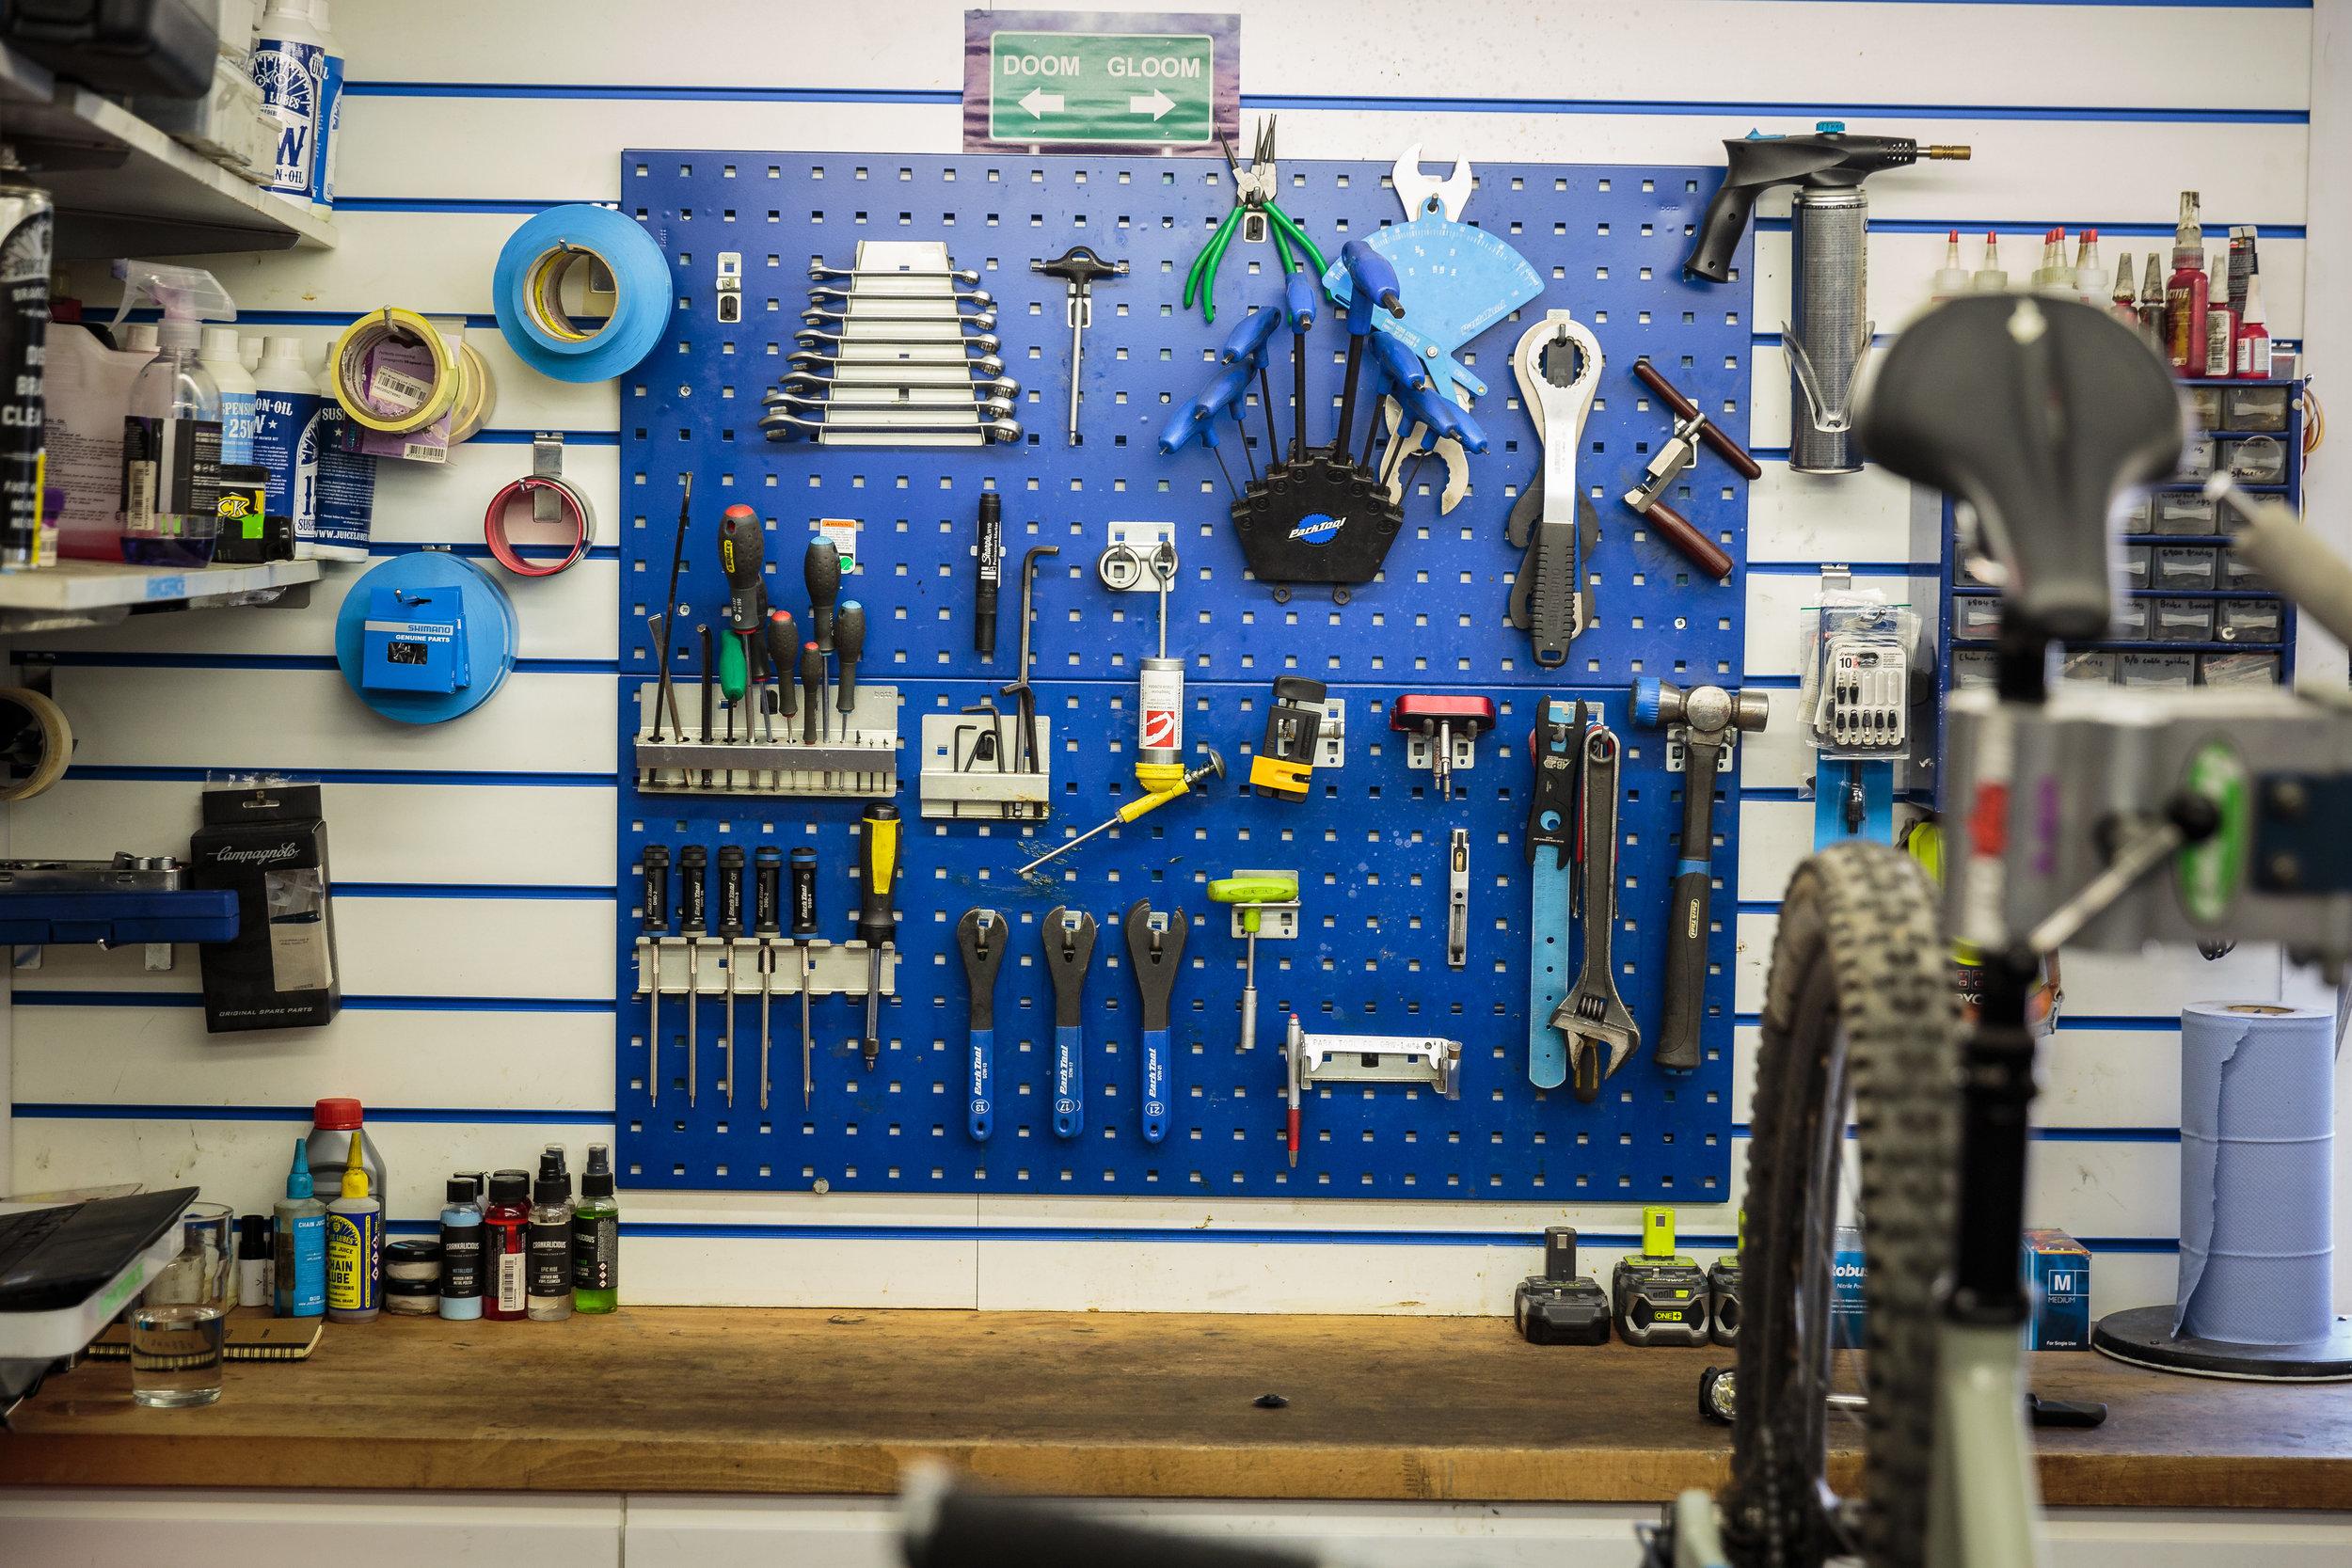 Bike Maintenance Tools